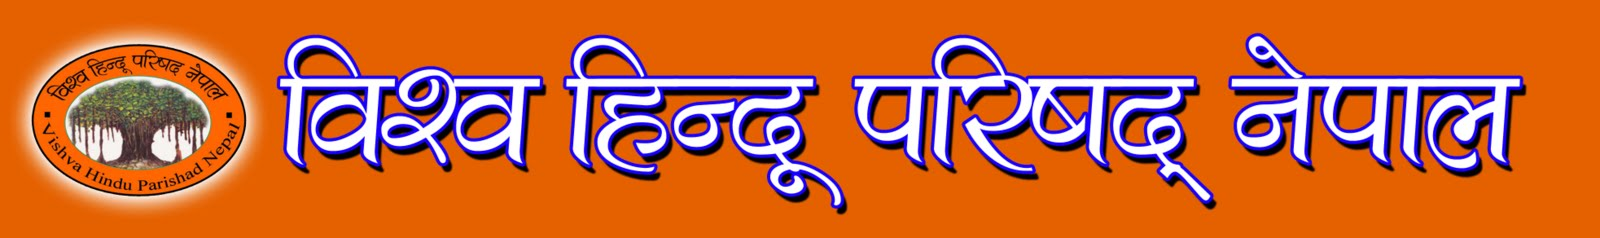 Vishwa Hindu Parishad Nepal